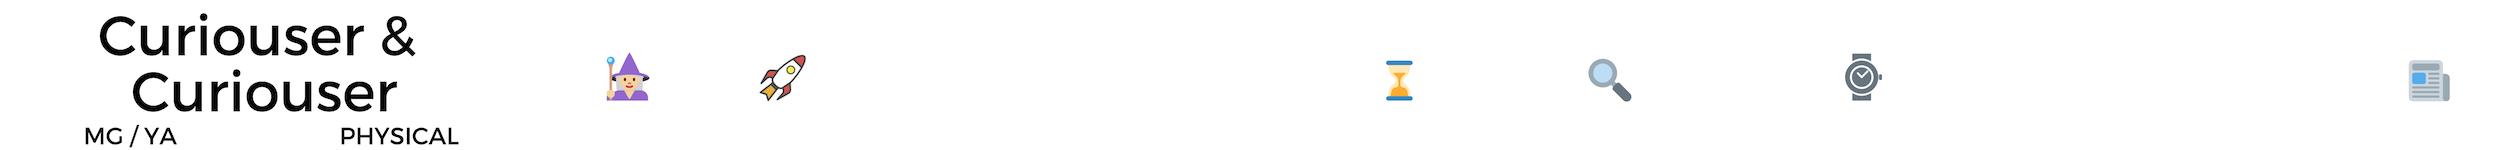 BOOK BLOG COMMUNITY _ BANNER + PROFILES [2500 x 150] (17).jpg